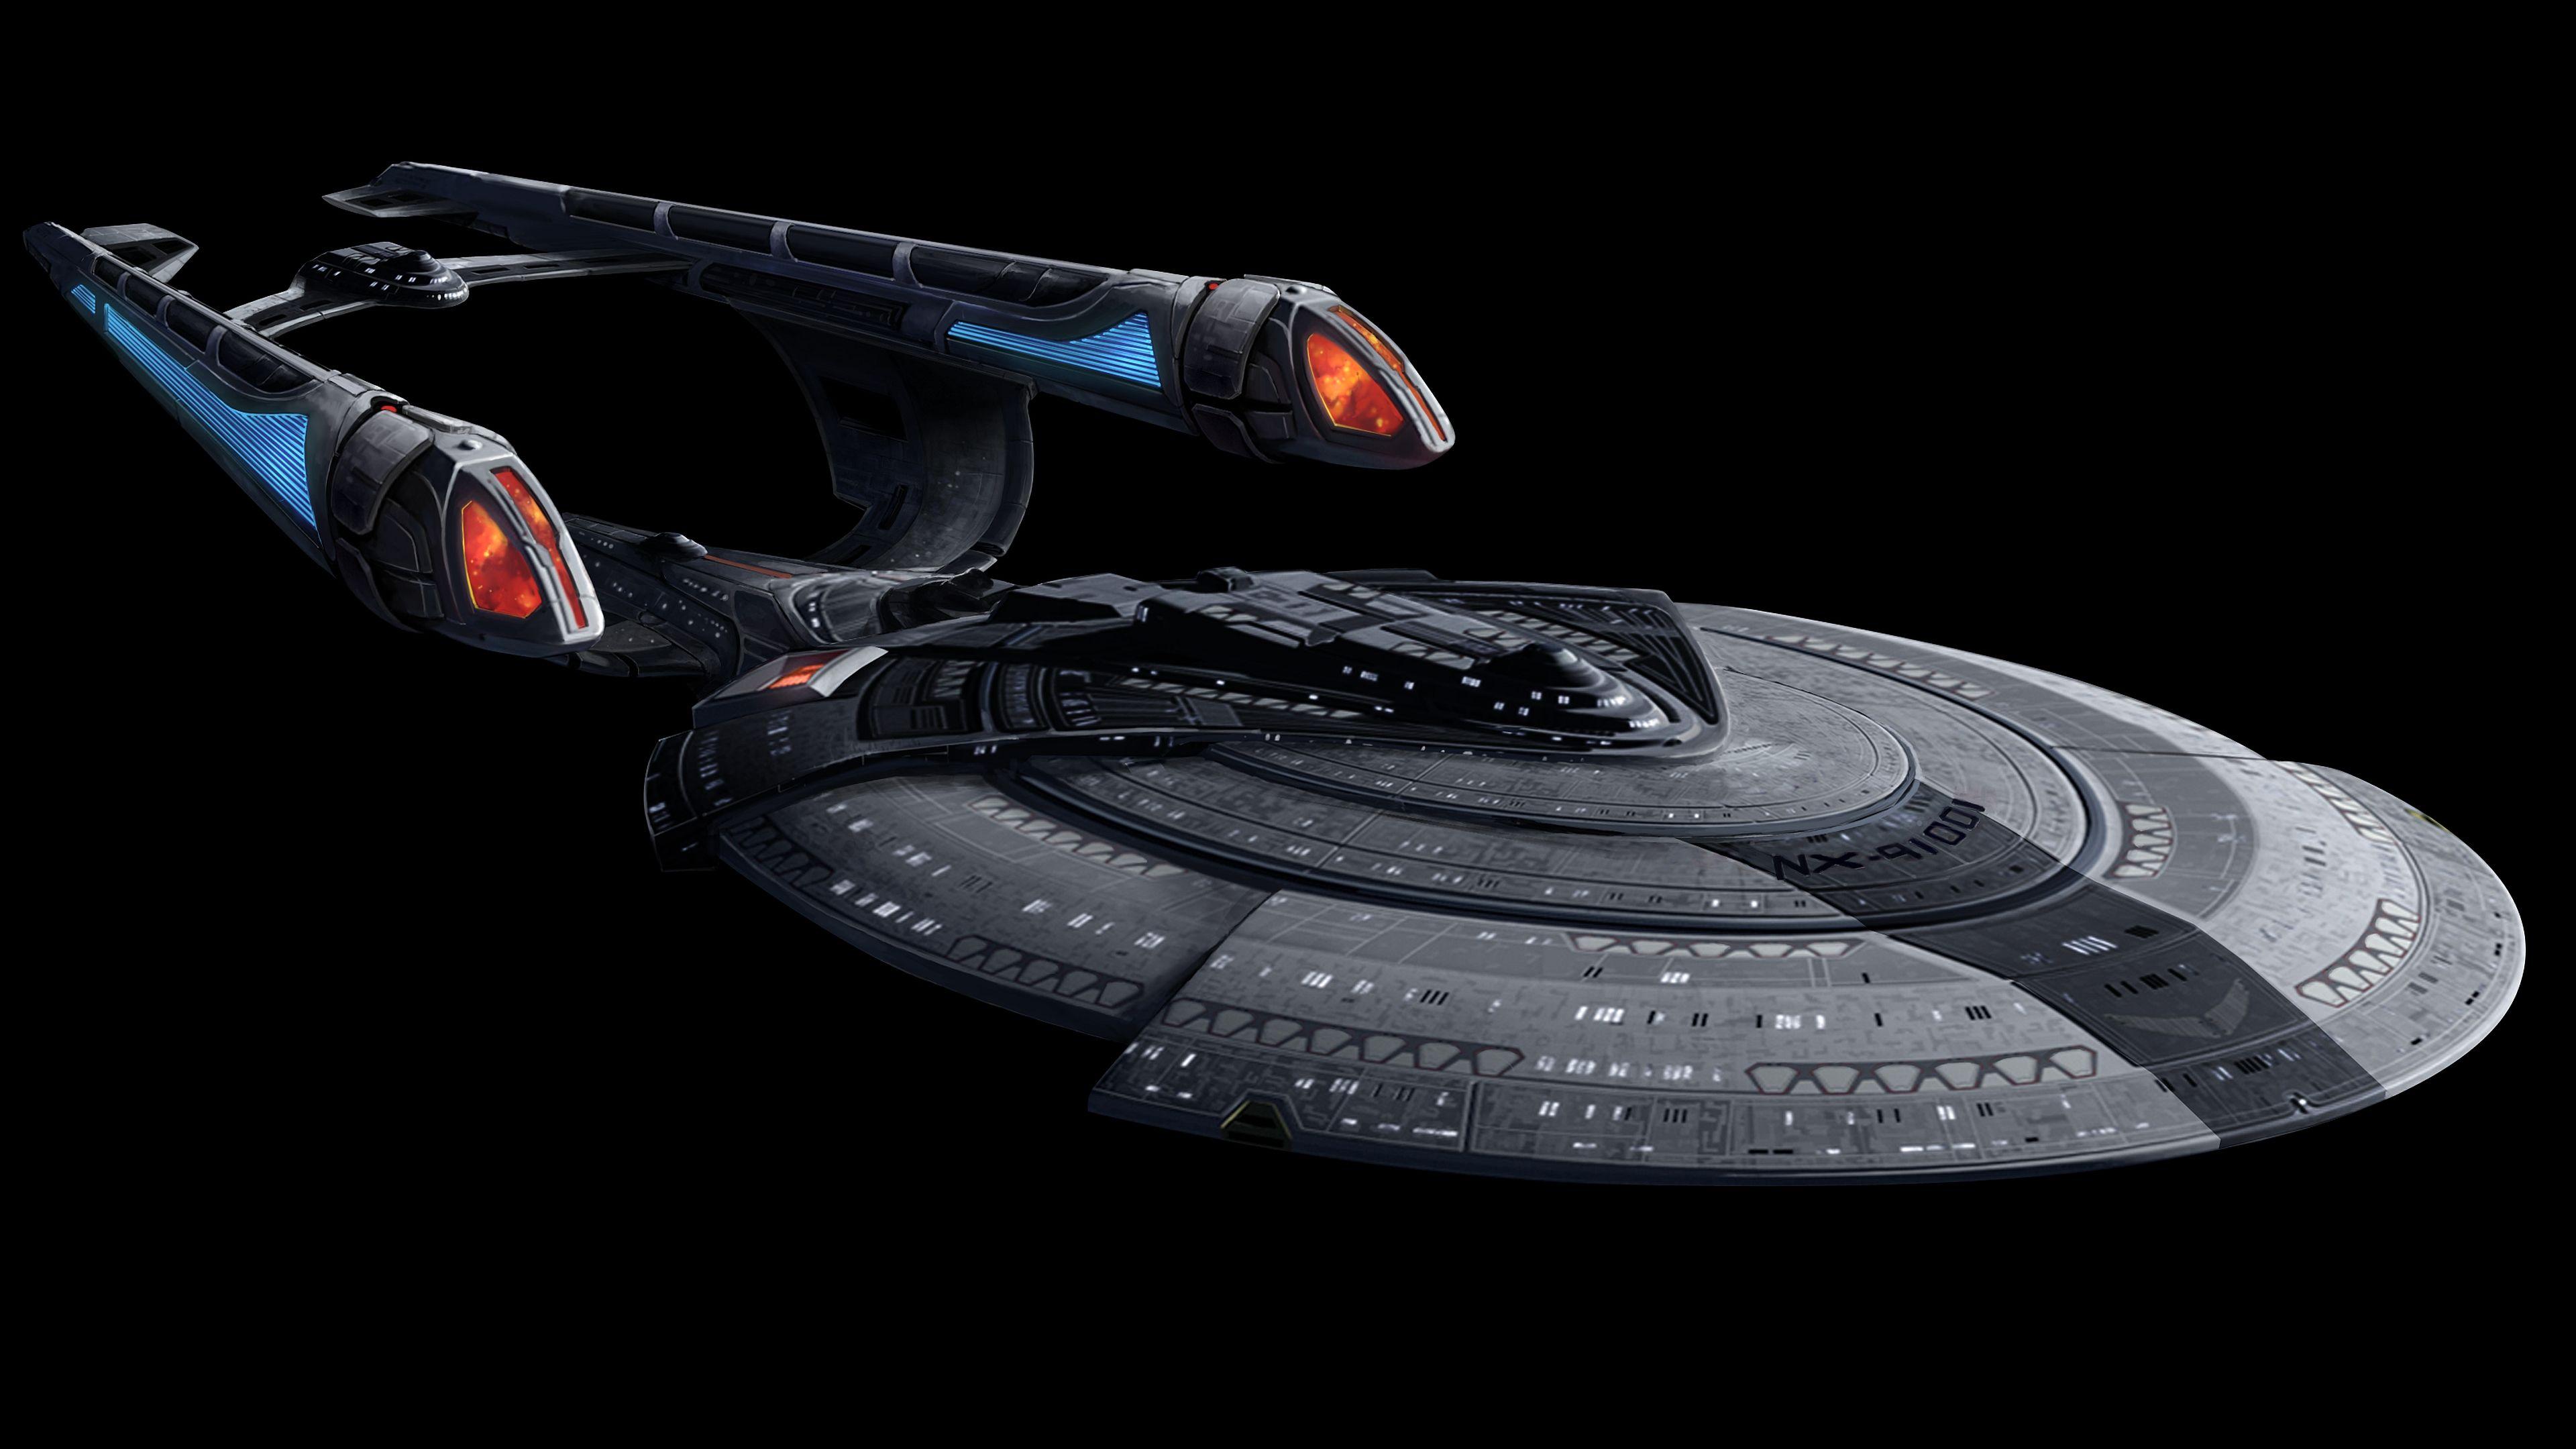 Sci Fi Star Trek Wallpaper Background 3840 X 2160 Id 327165 Wallpaper Abyss Star Trek Online Star Trek Wallpaper Star Trek Ships